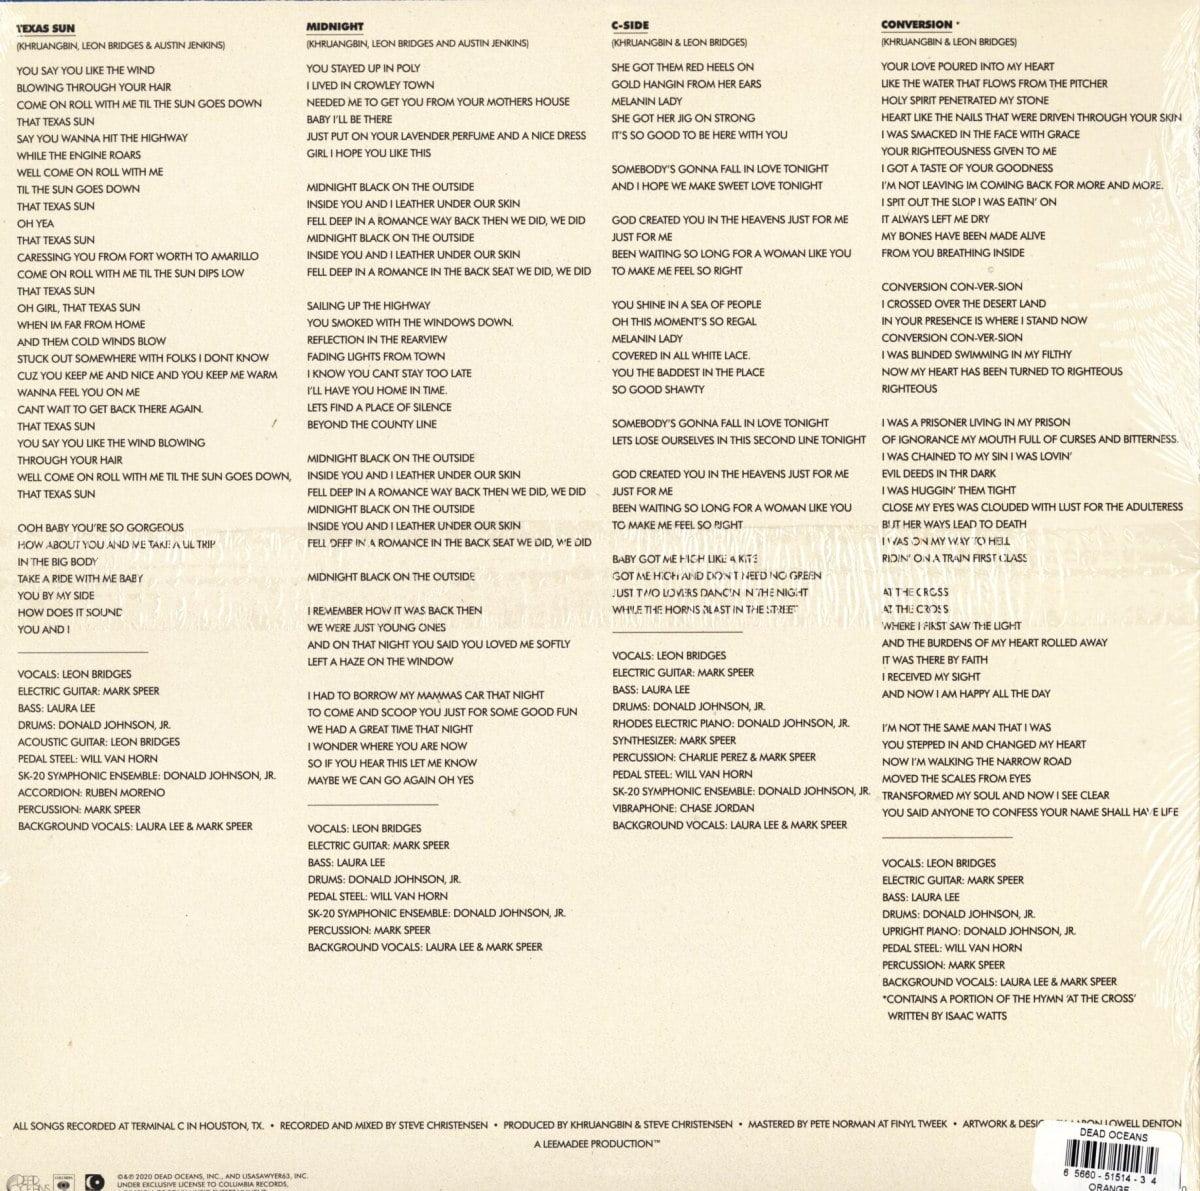 Khruangbin and Leon Bridges - Texas Sun - Limited Edition, Orange, Colored Vinyl, EP, Dead Oceans, 2020